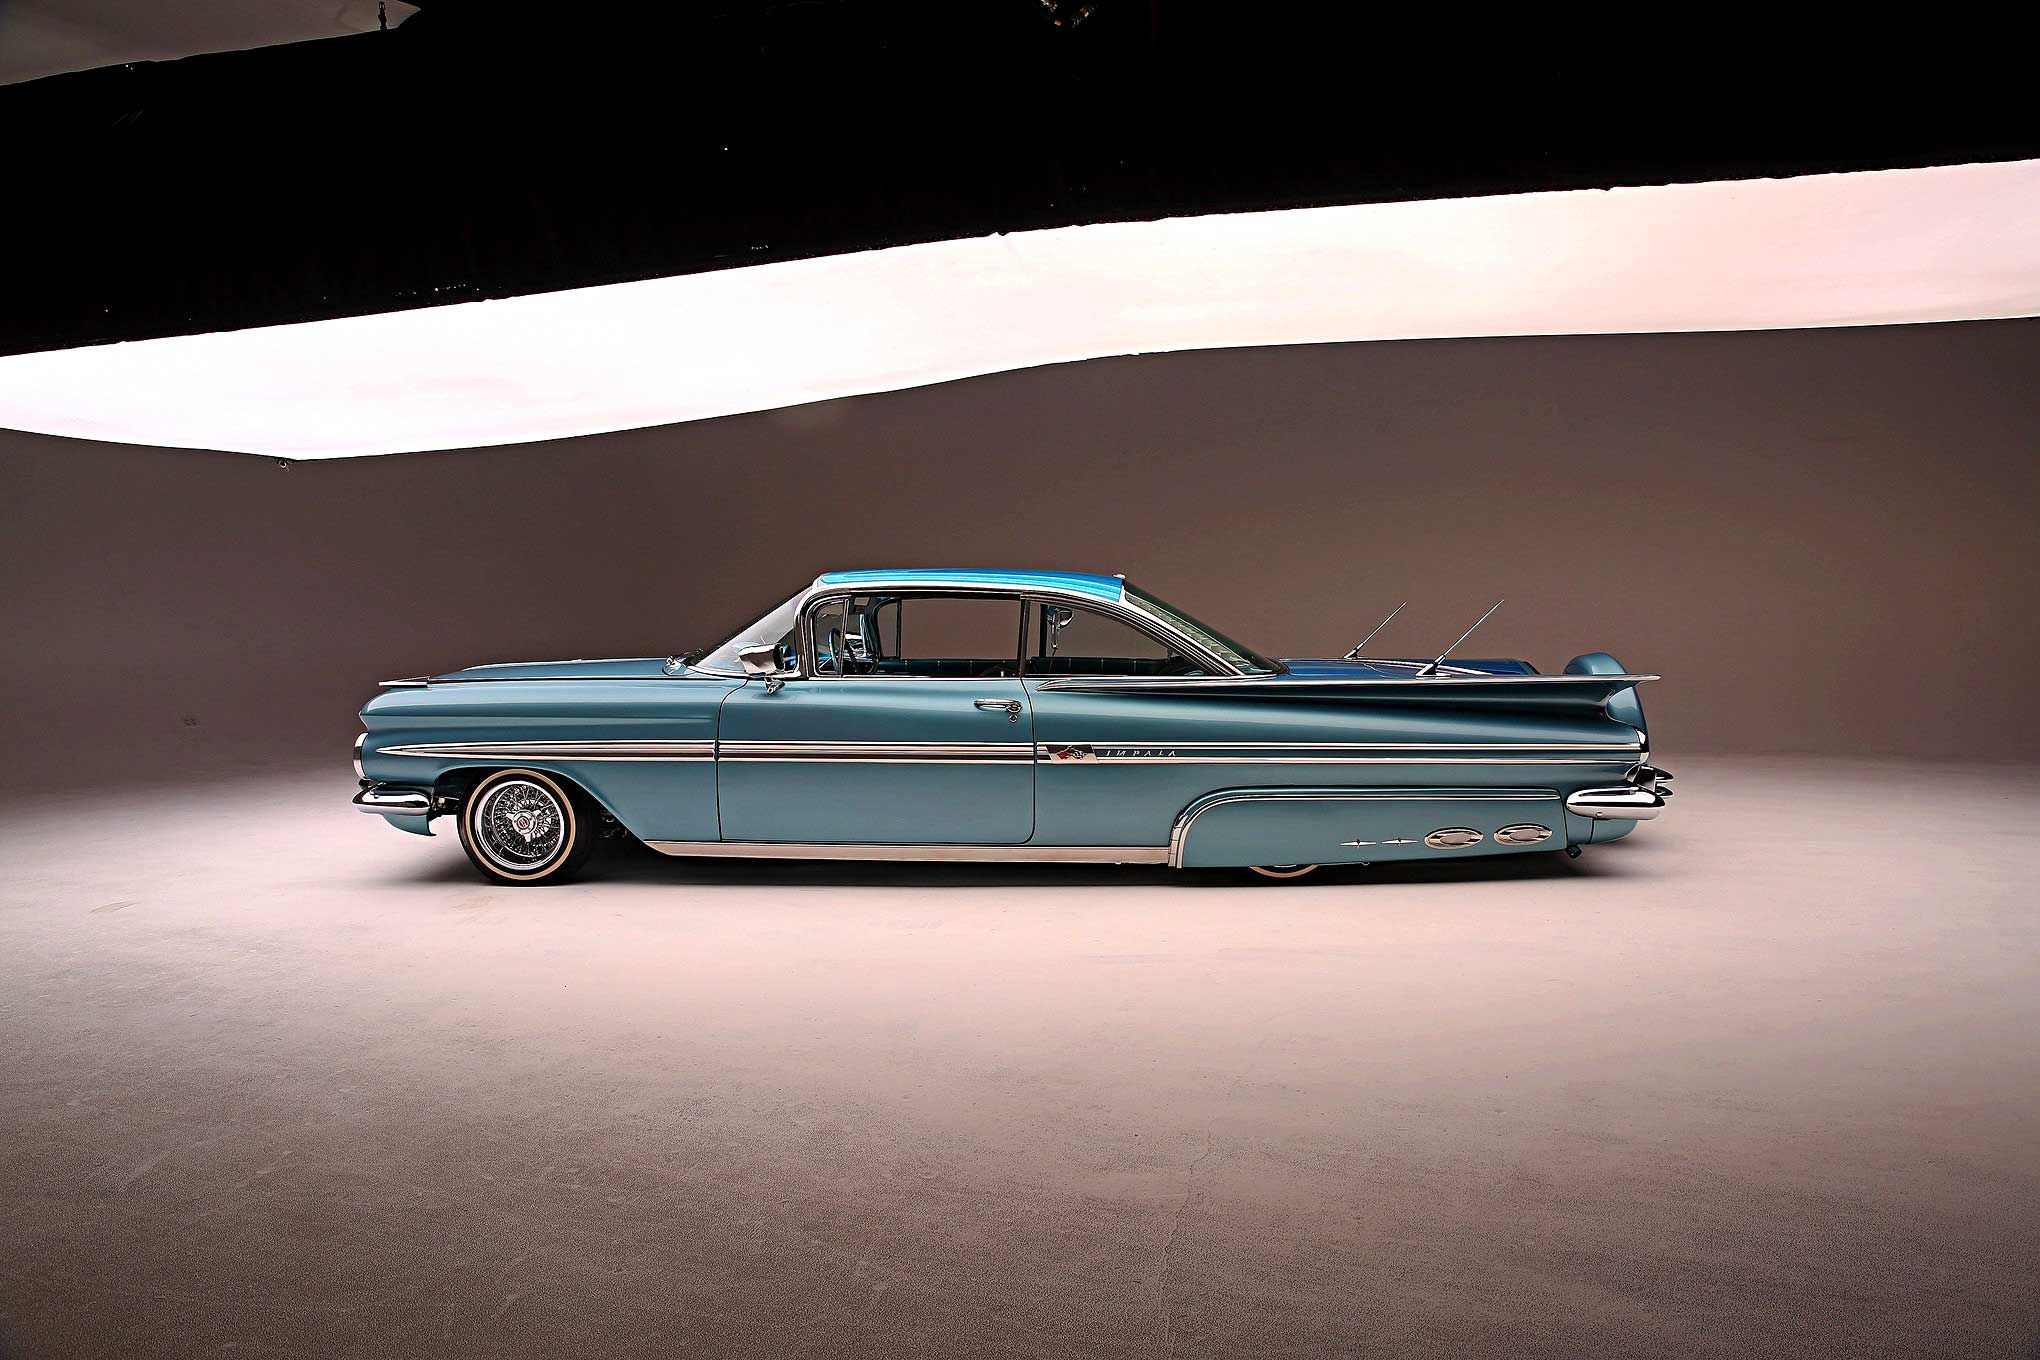 1959 Chevrolet Impala Built In Tijuana In 2020 Chevrolet Impala